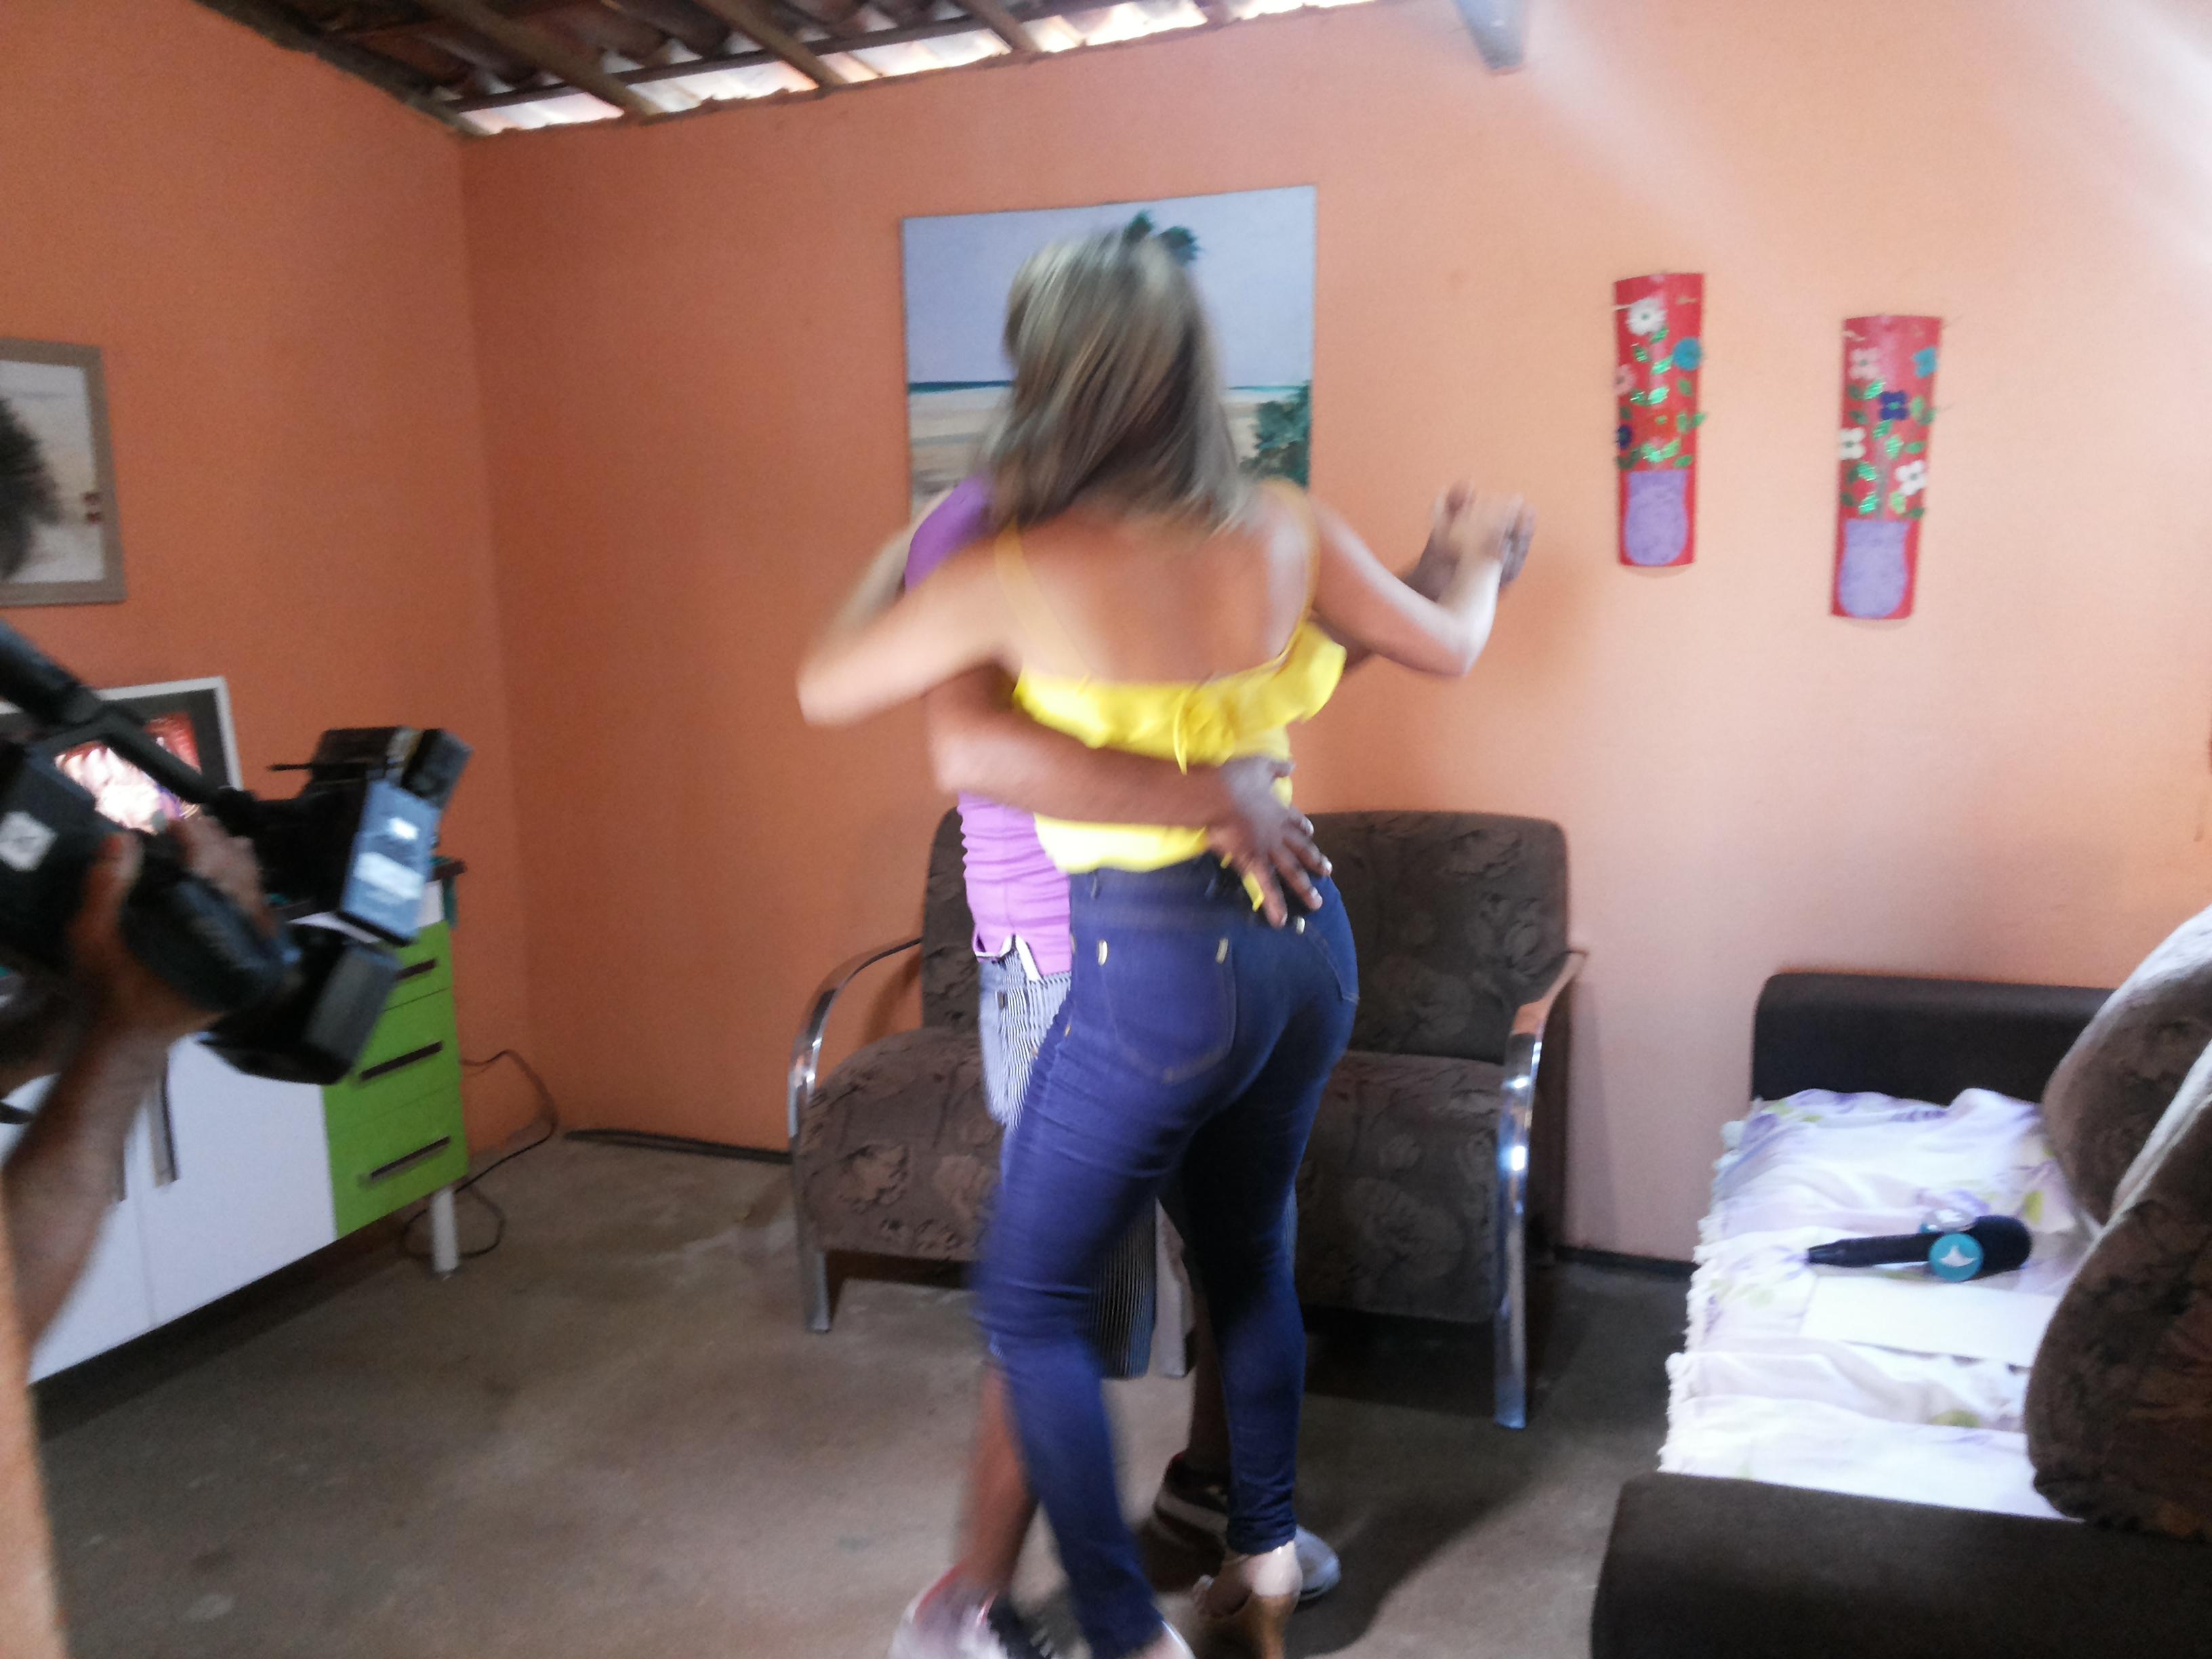 15-11-24 Lorrane Cabral conta a história de Erivando Braga no Gente na TV. Foto Dadynha Saturnino (16)